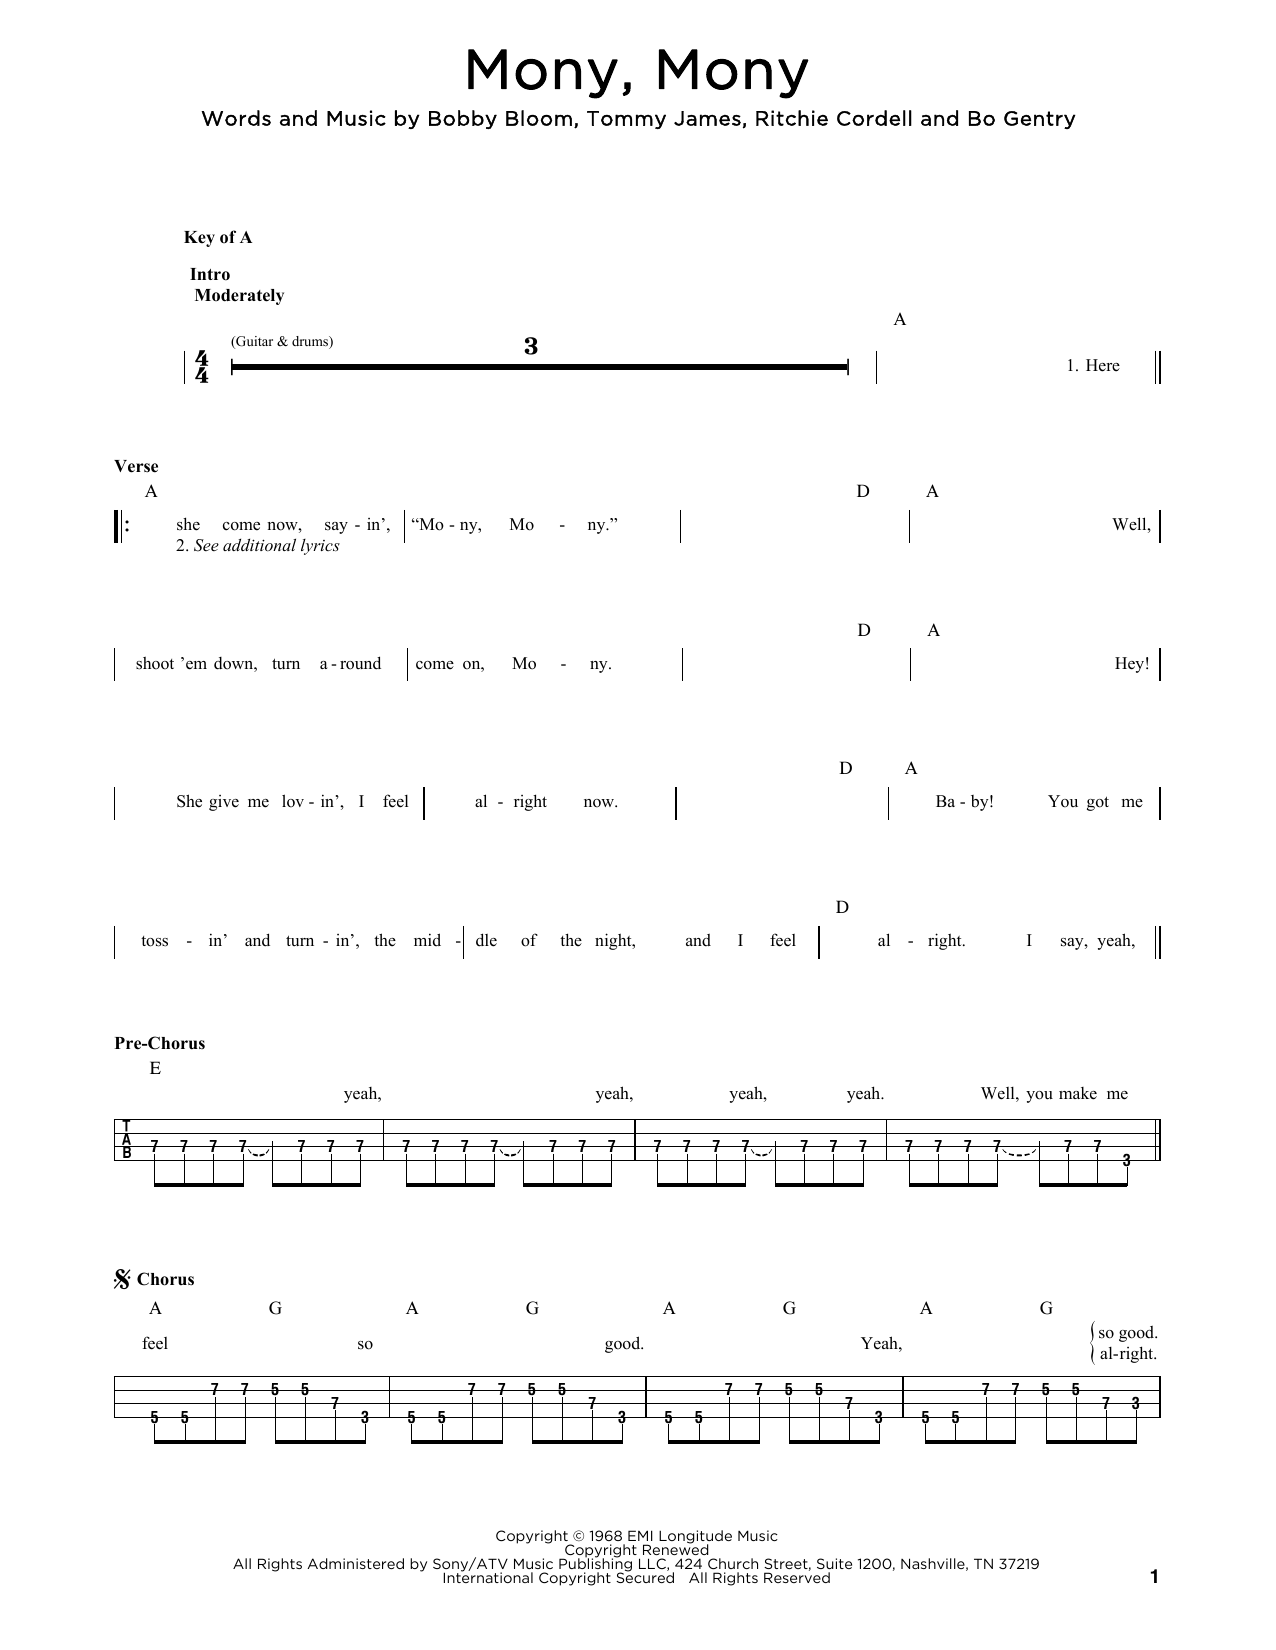 Mony, Mony sheet music